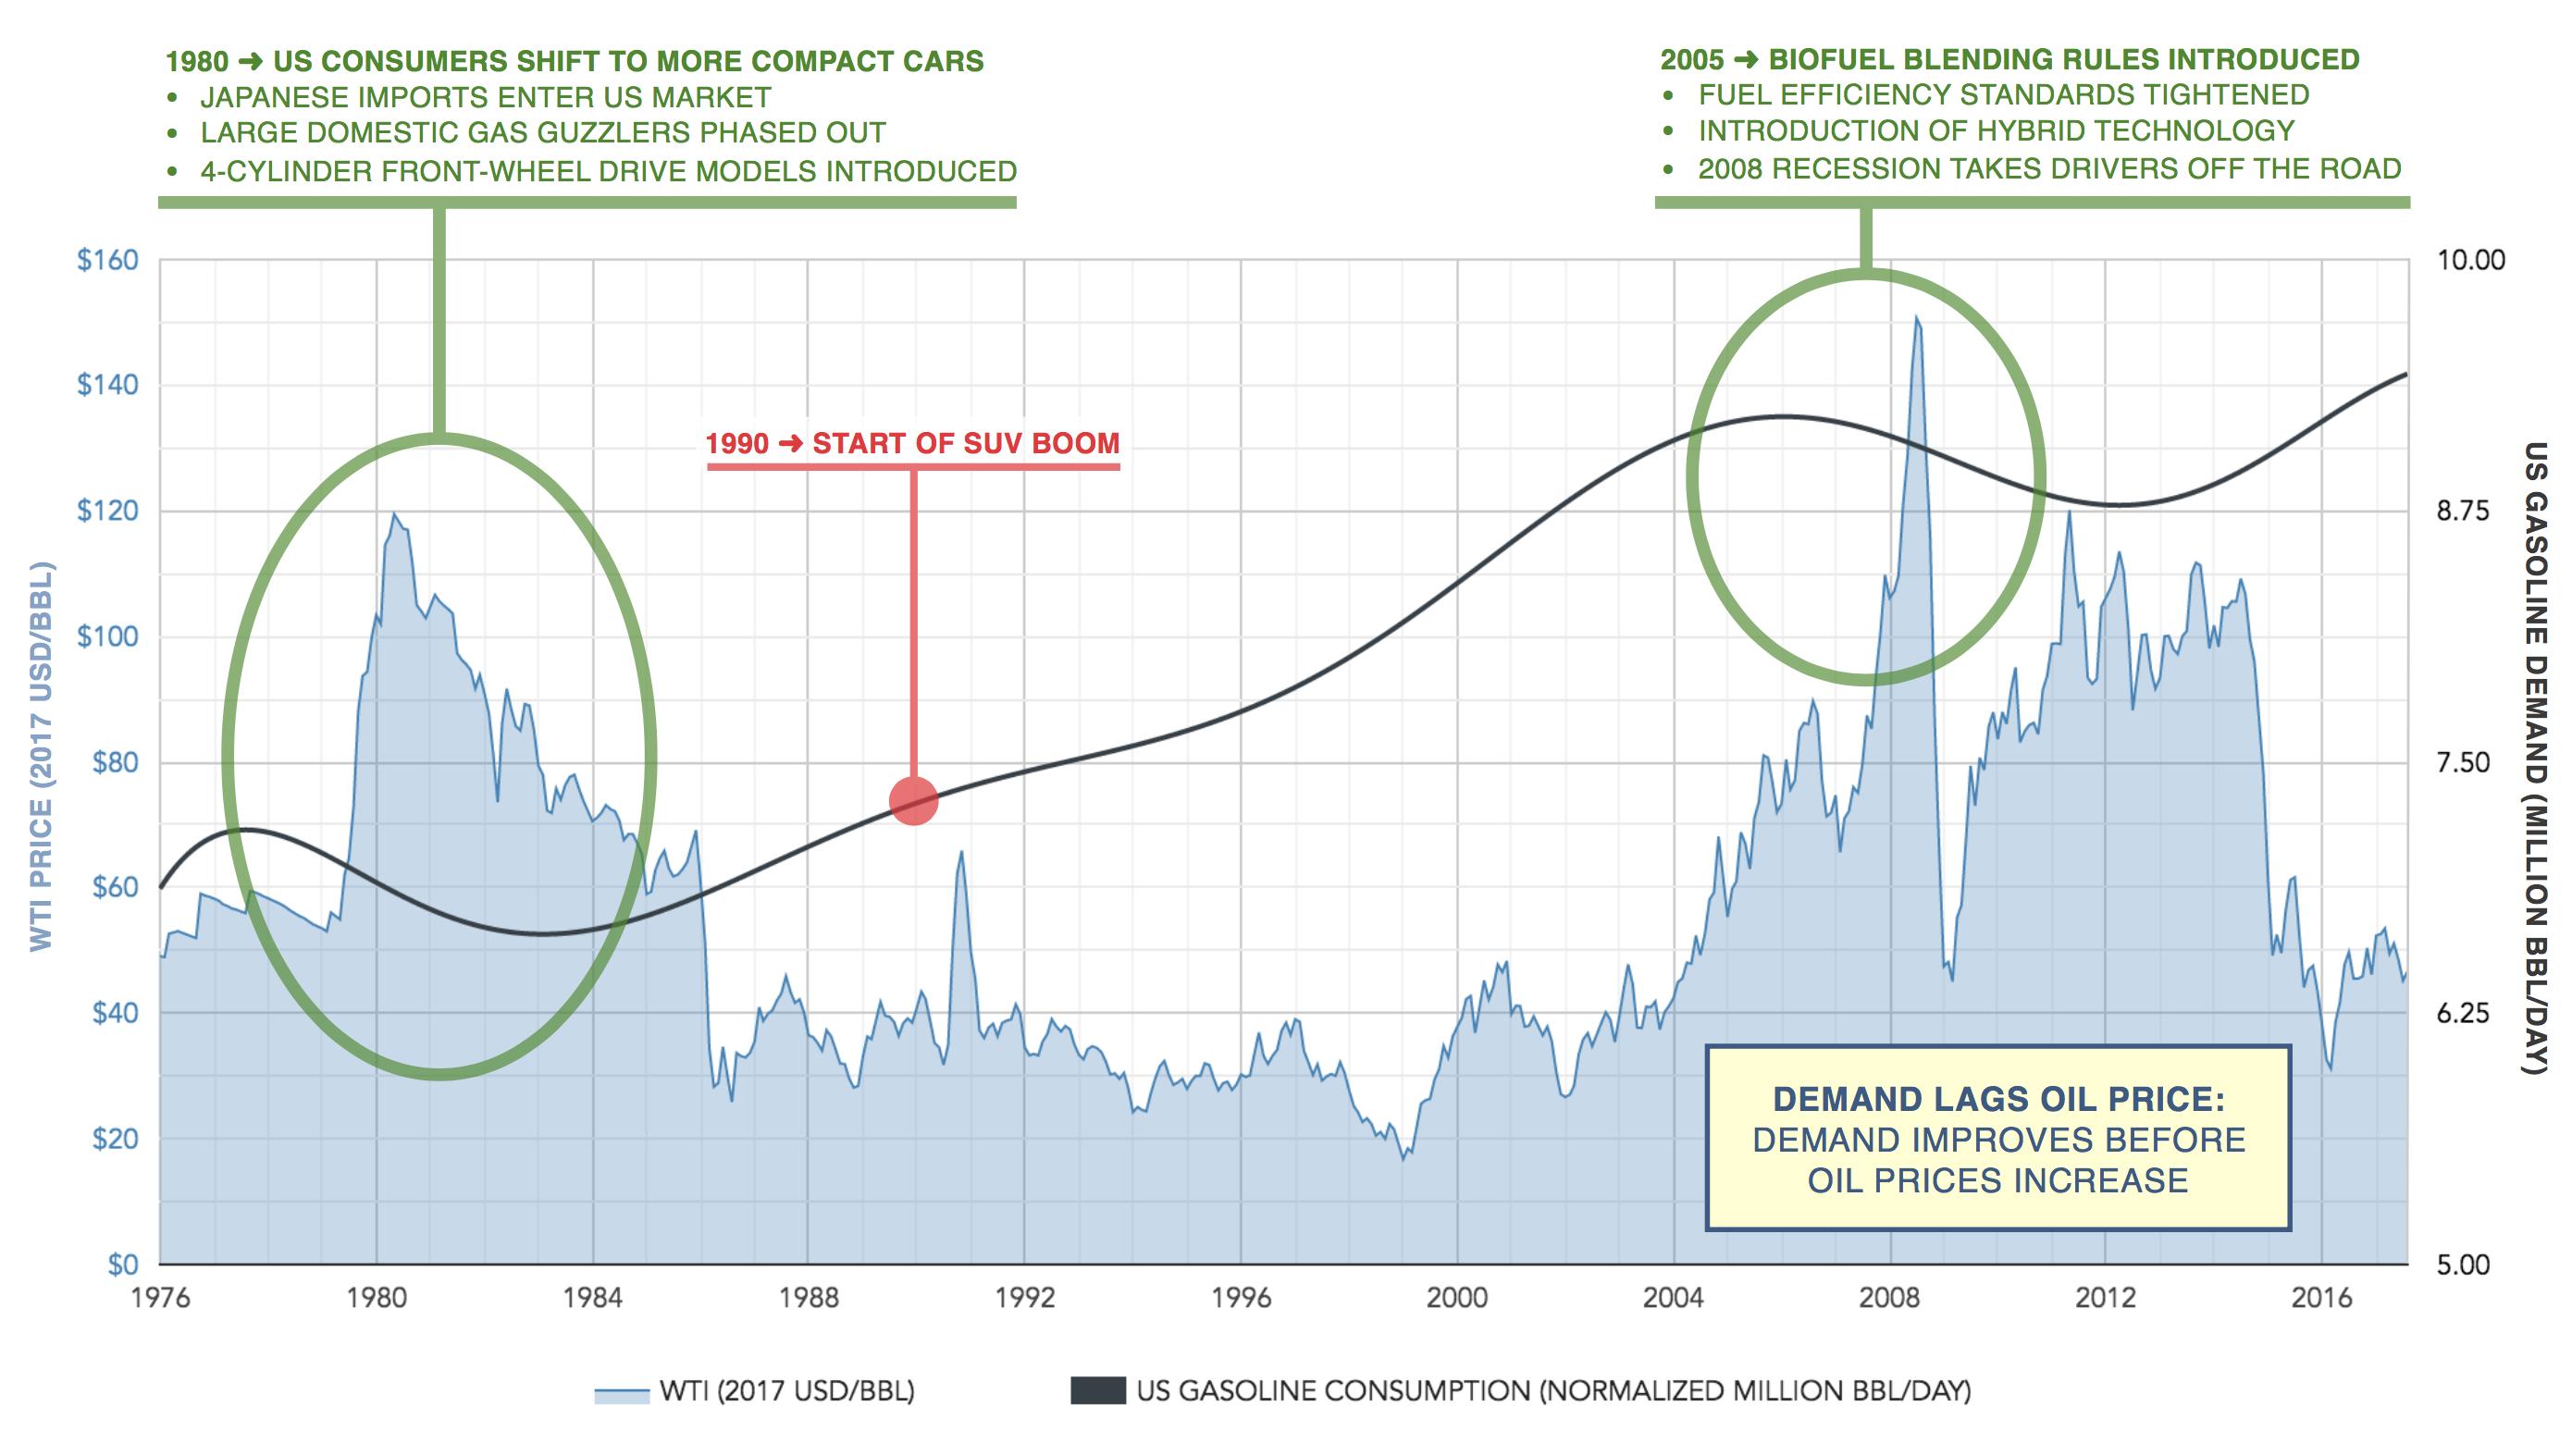 US fuel efficiency standards gasoline demand versus oil prices